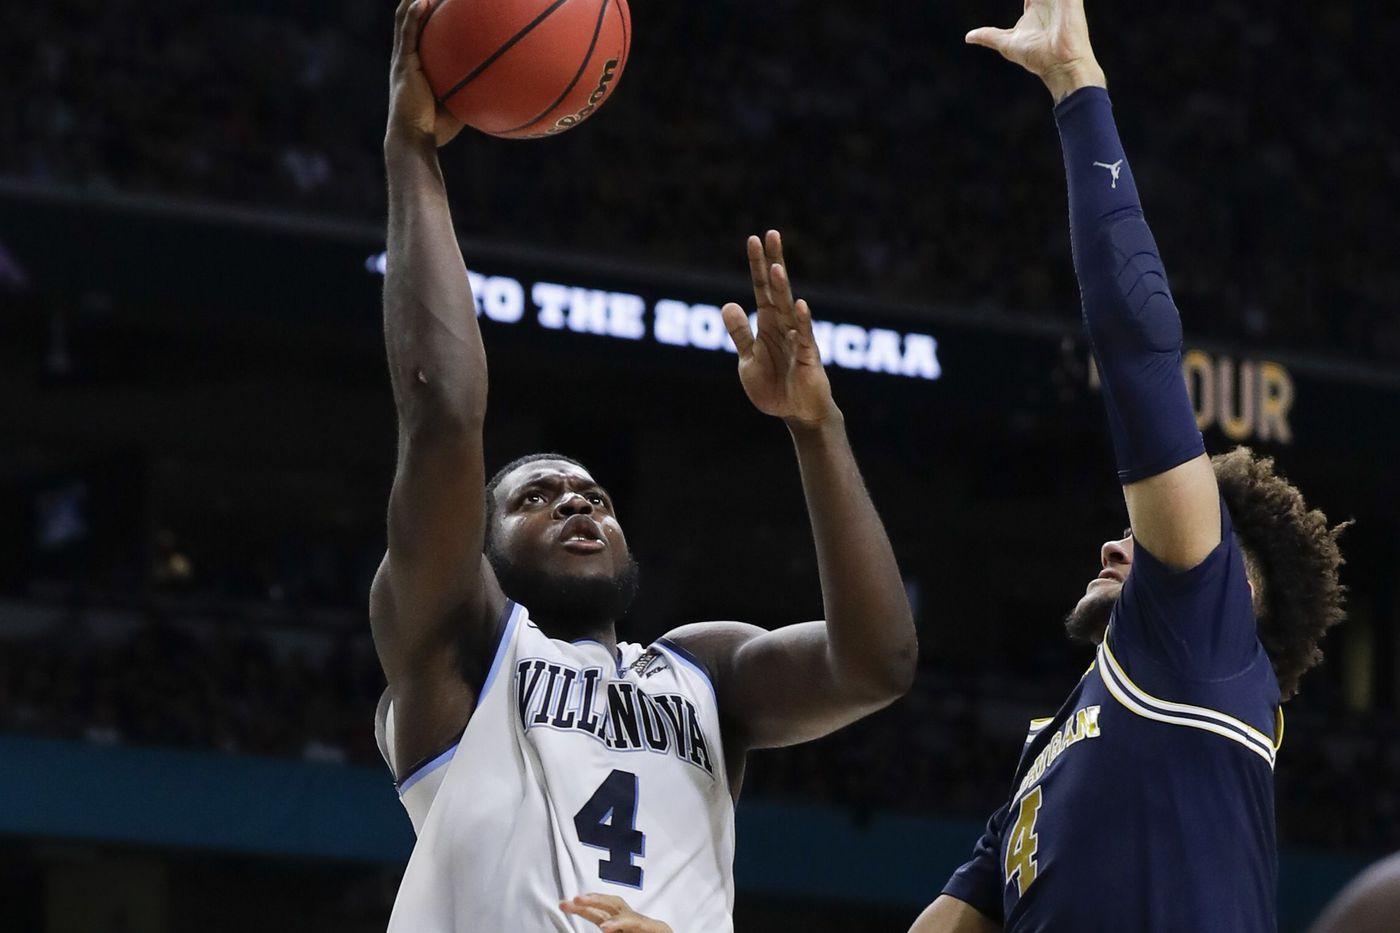 Strong First Half Gives Michigan The Win Over Villanova